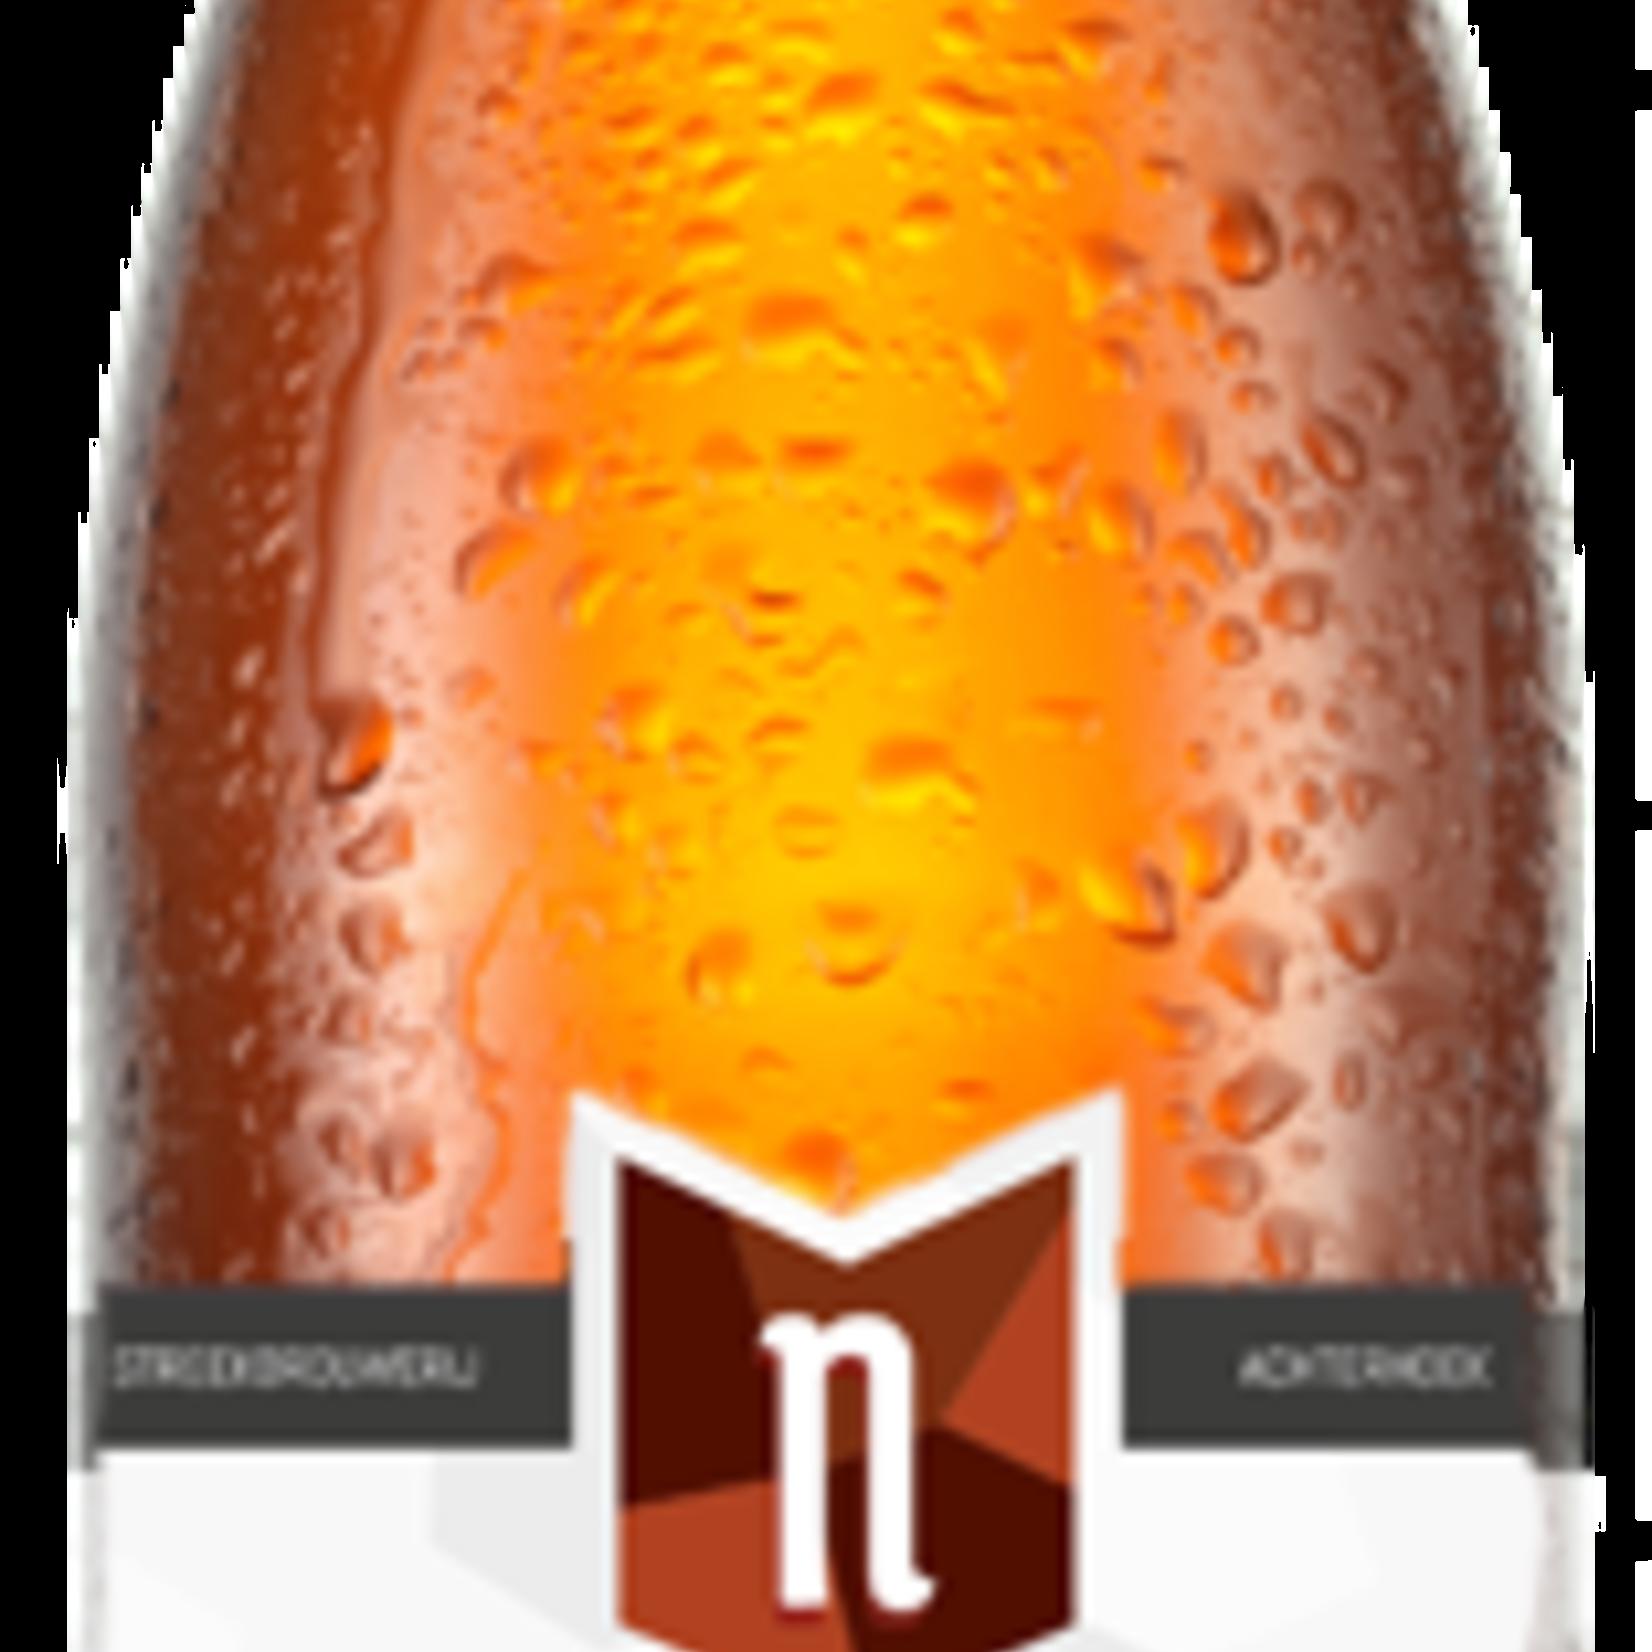 Dubbel bier   33cl (Nootsaeck bier)